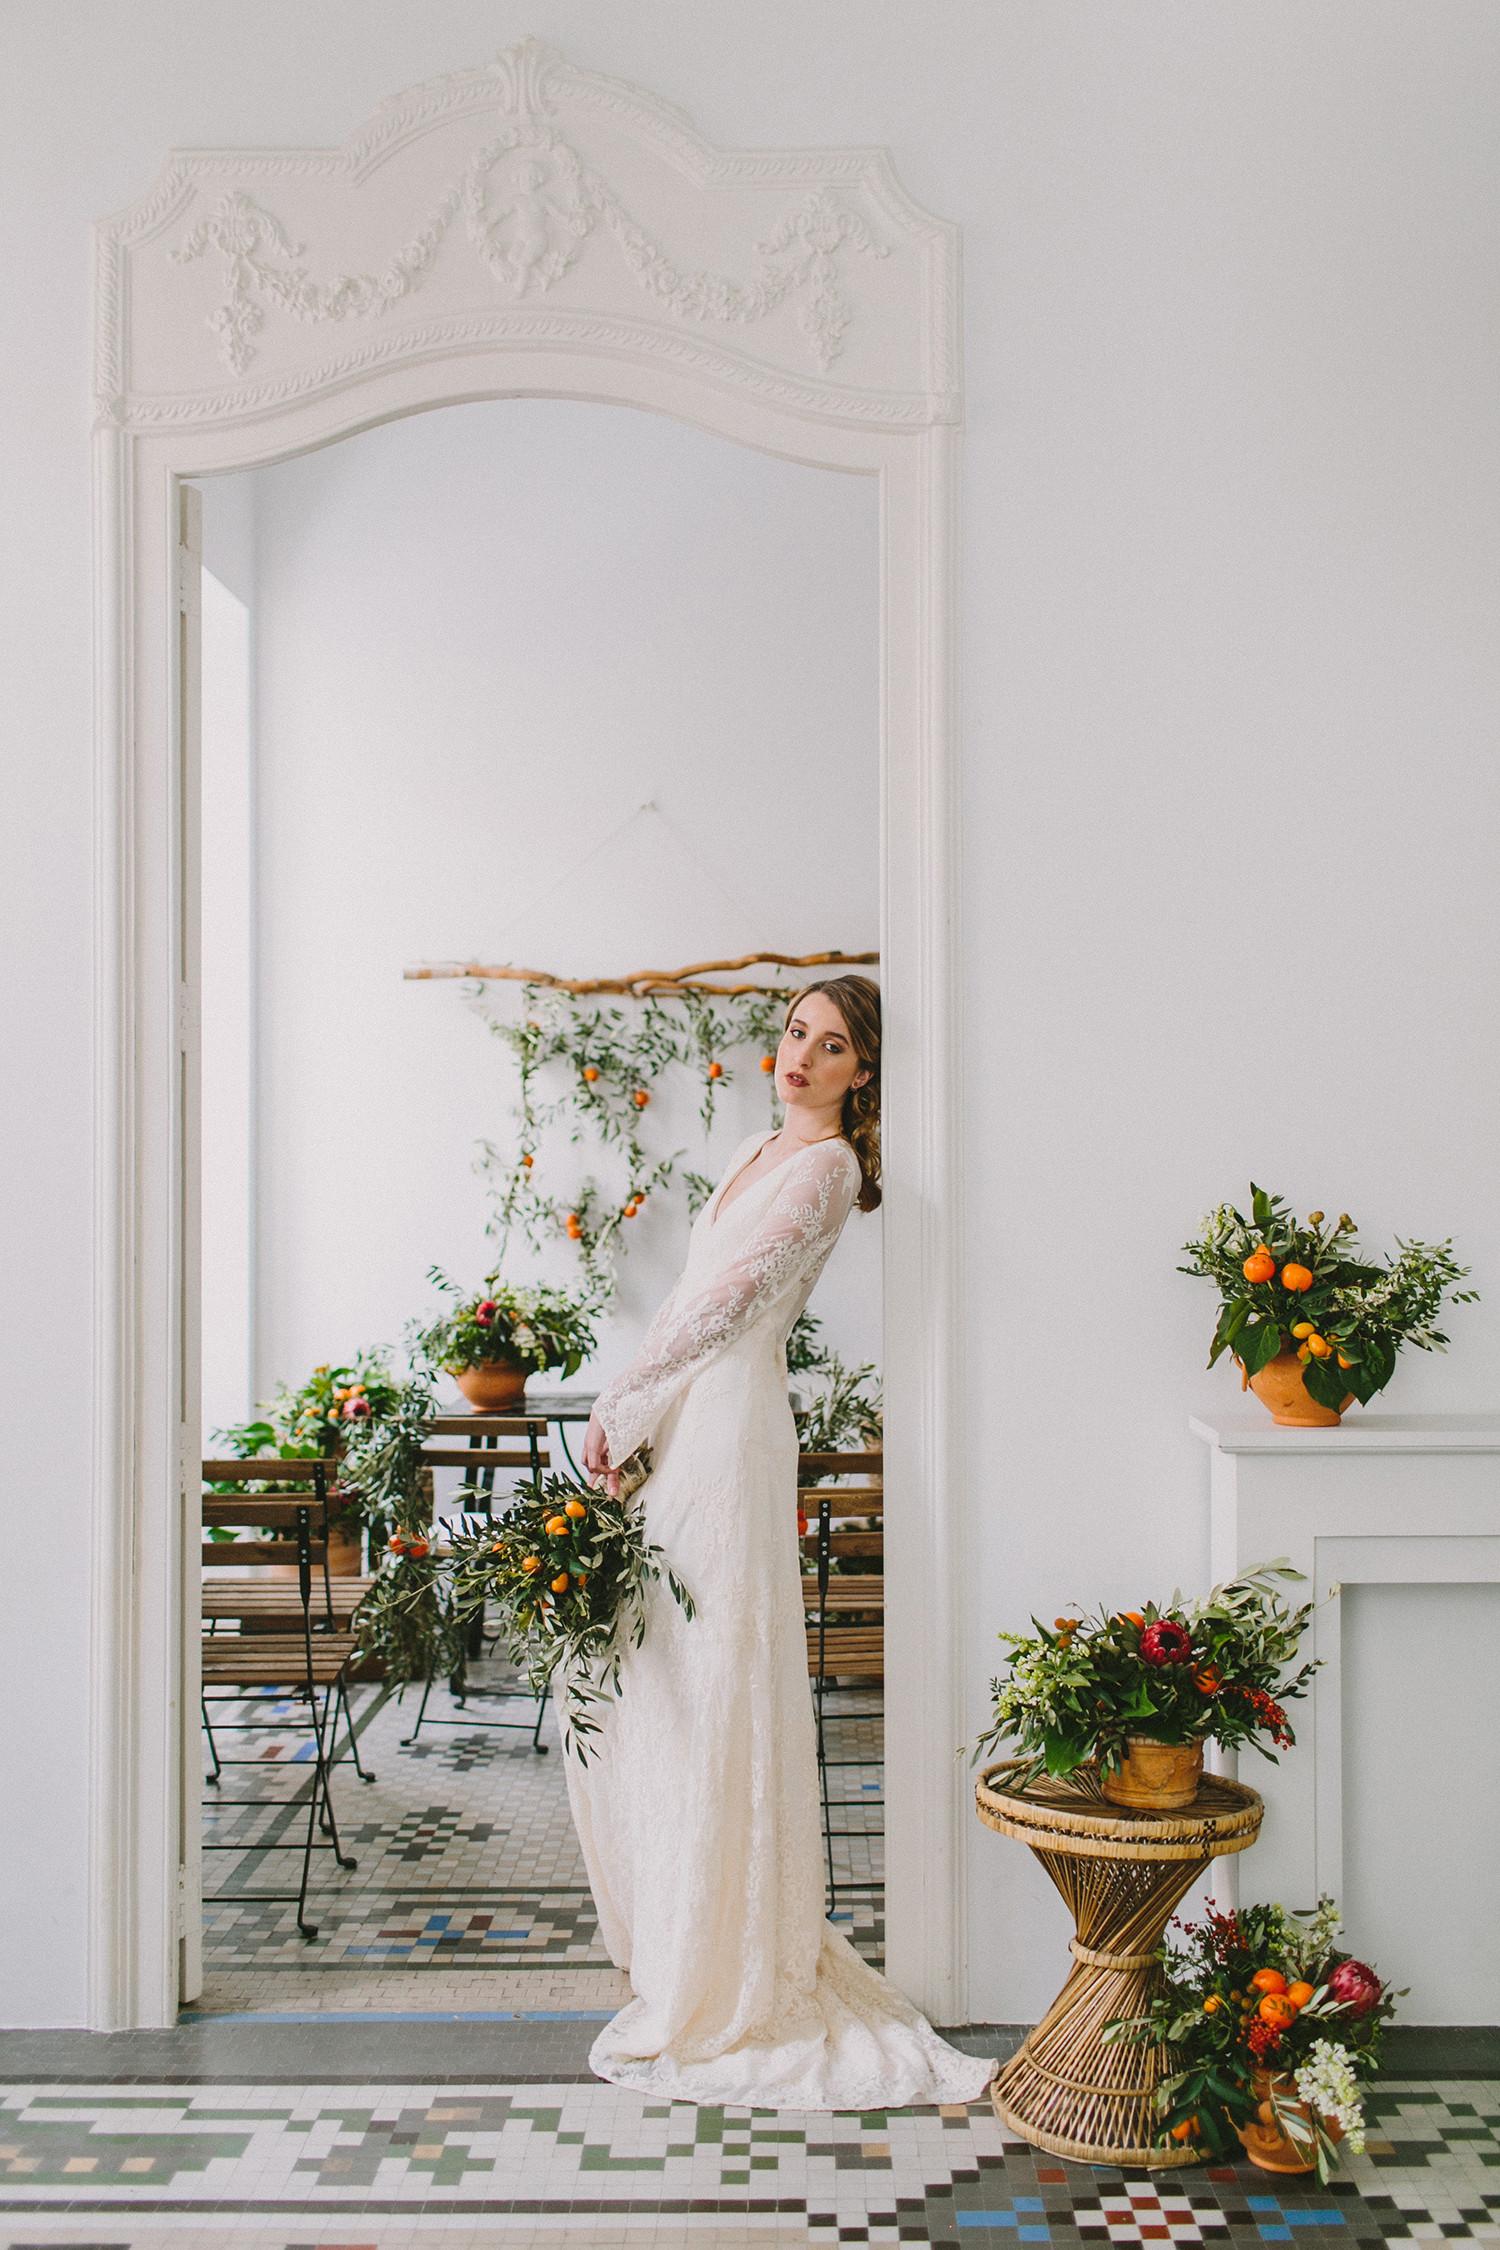 MEDITERRANEAN WEDDING-14208-macarenagea